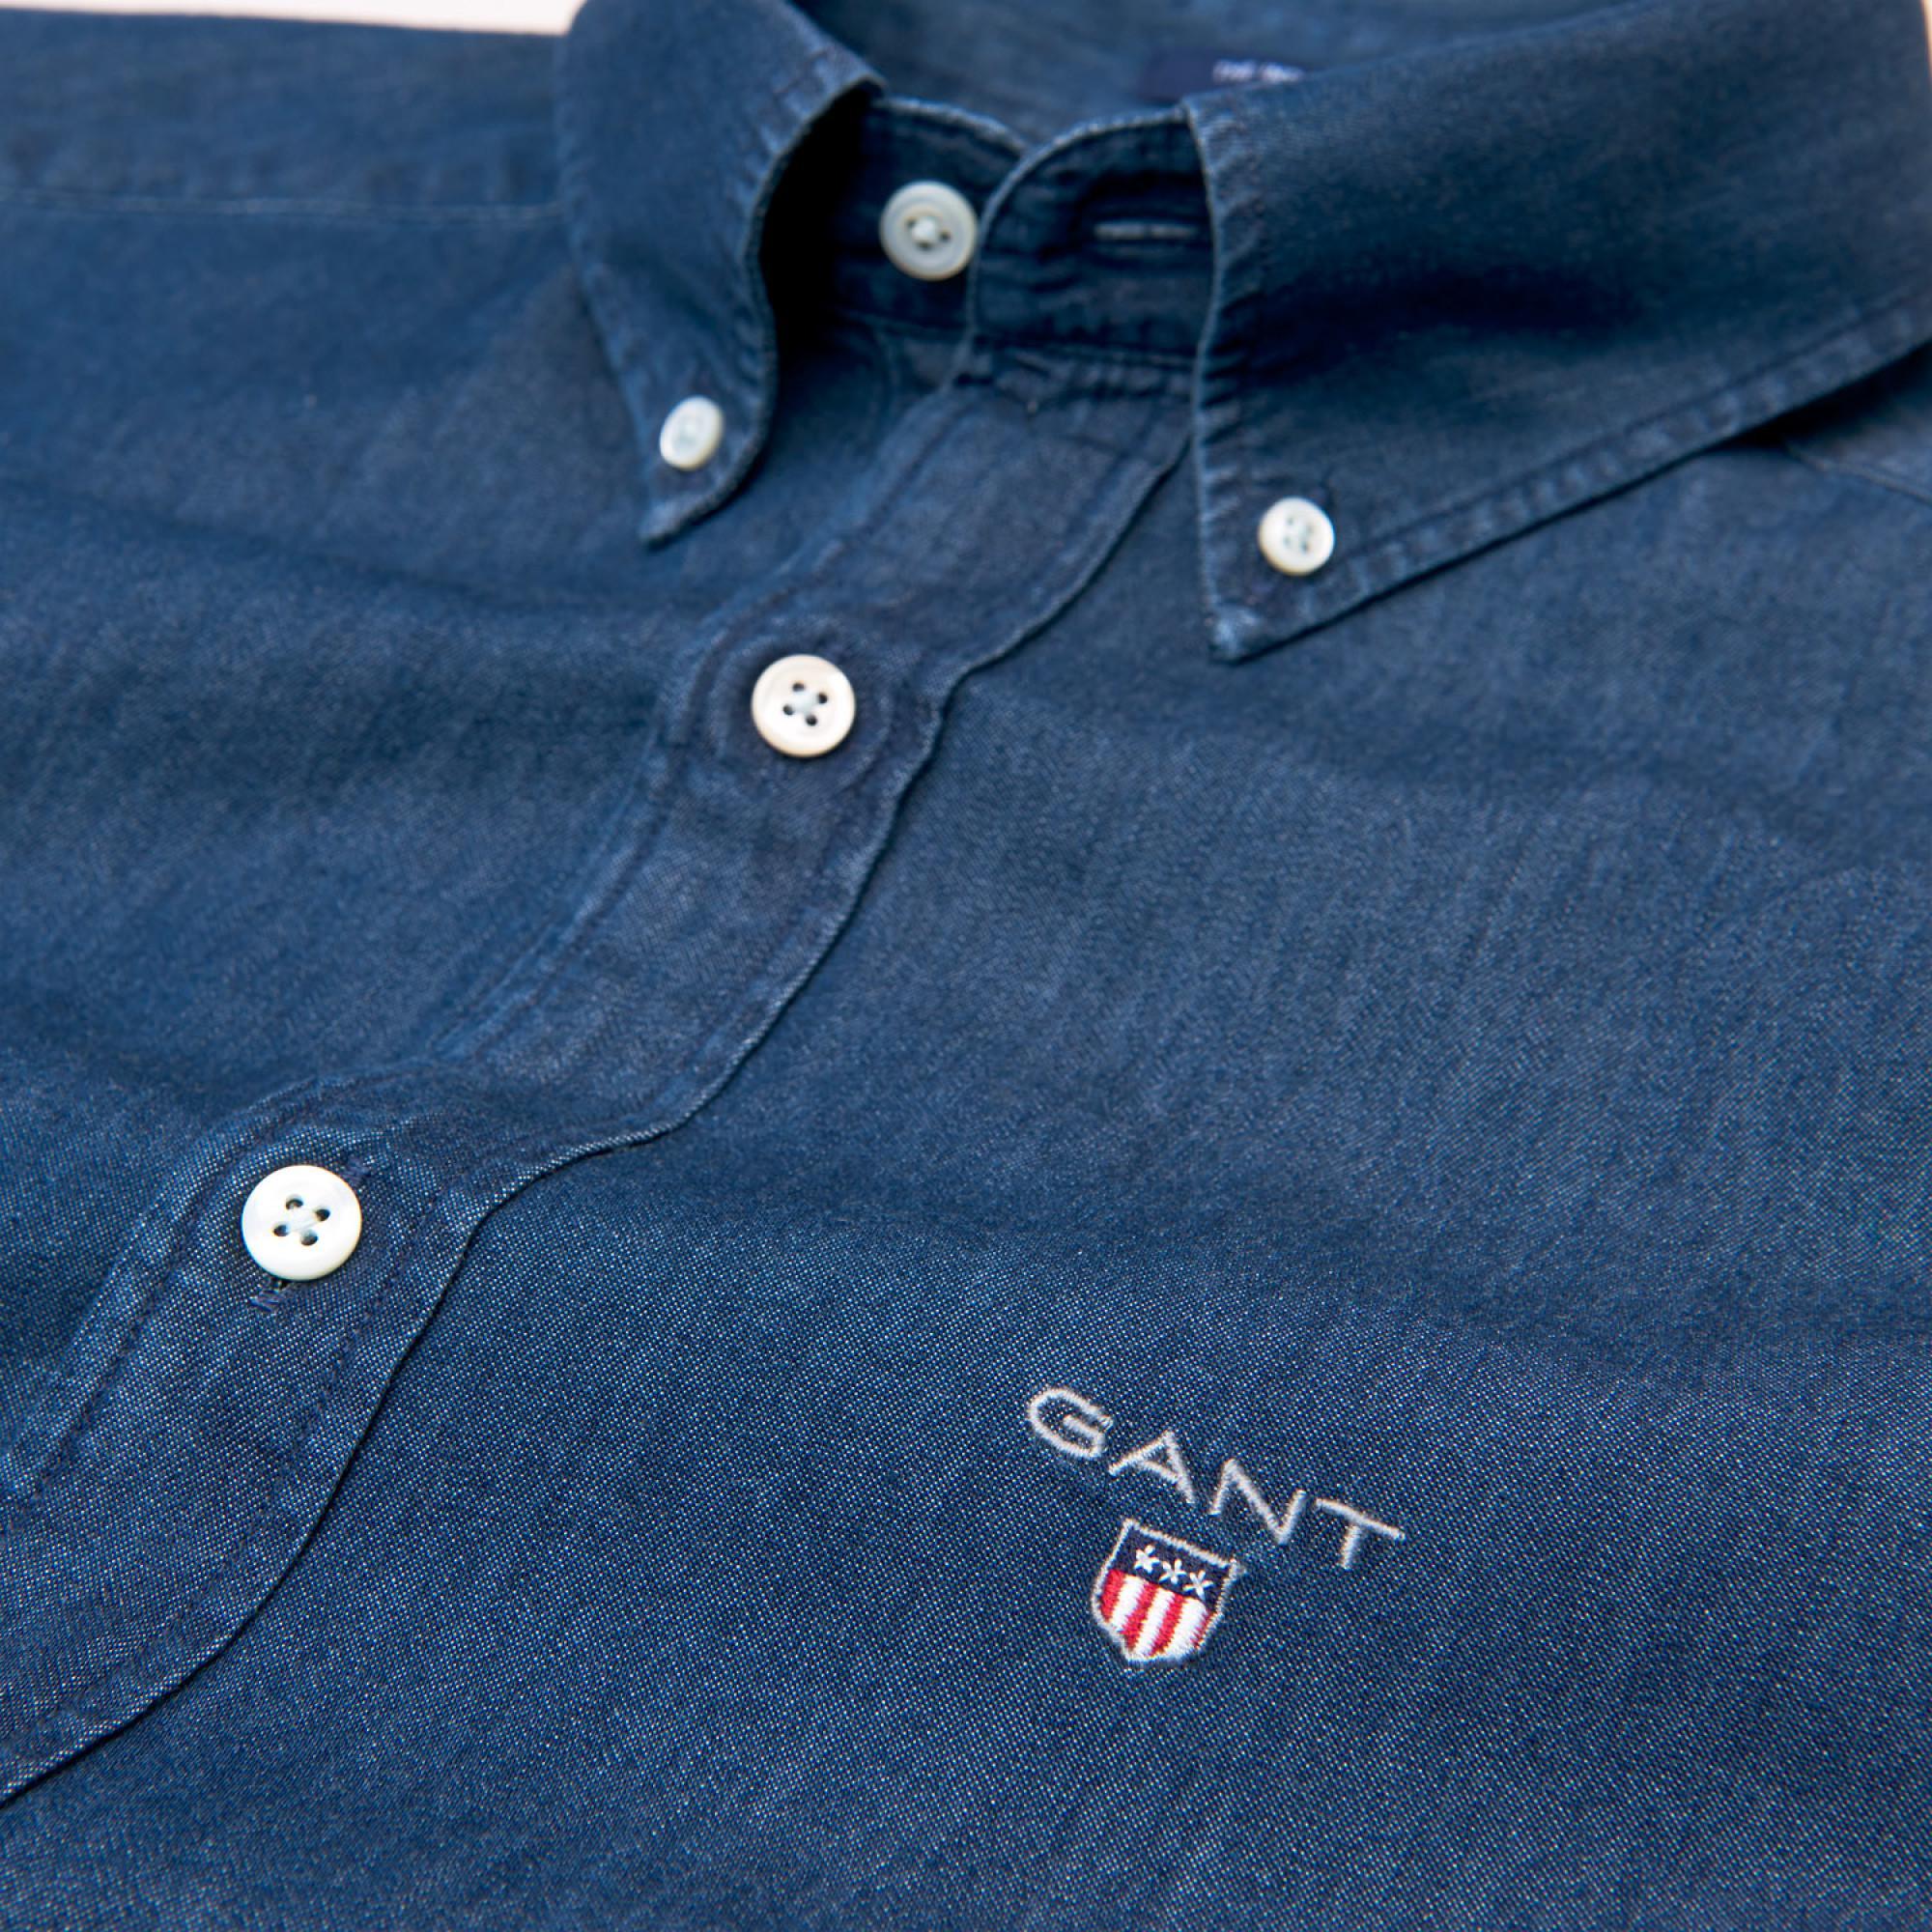 62328ac92b4 Gant - Blue Slim Indigo Shirt for Men - Lyst. View fullscreen